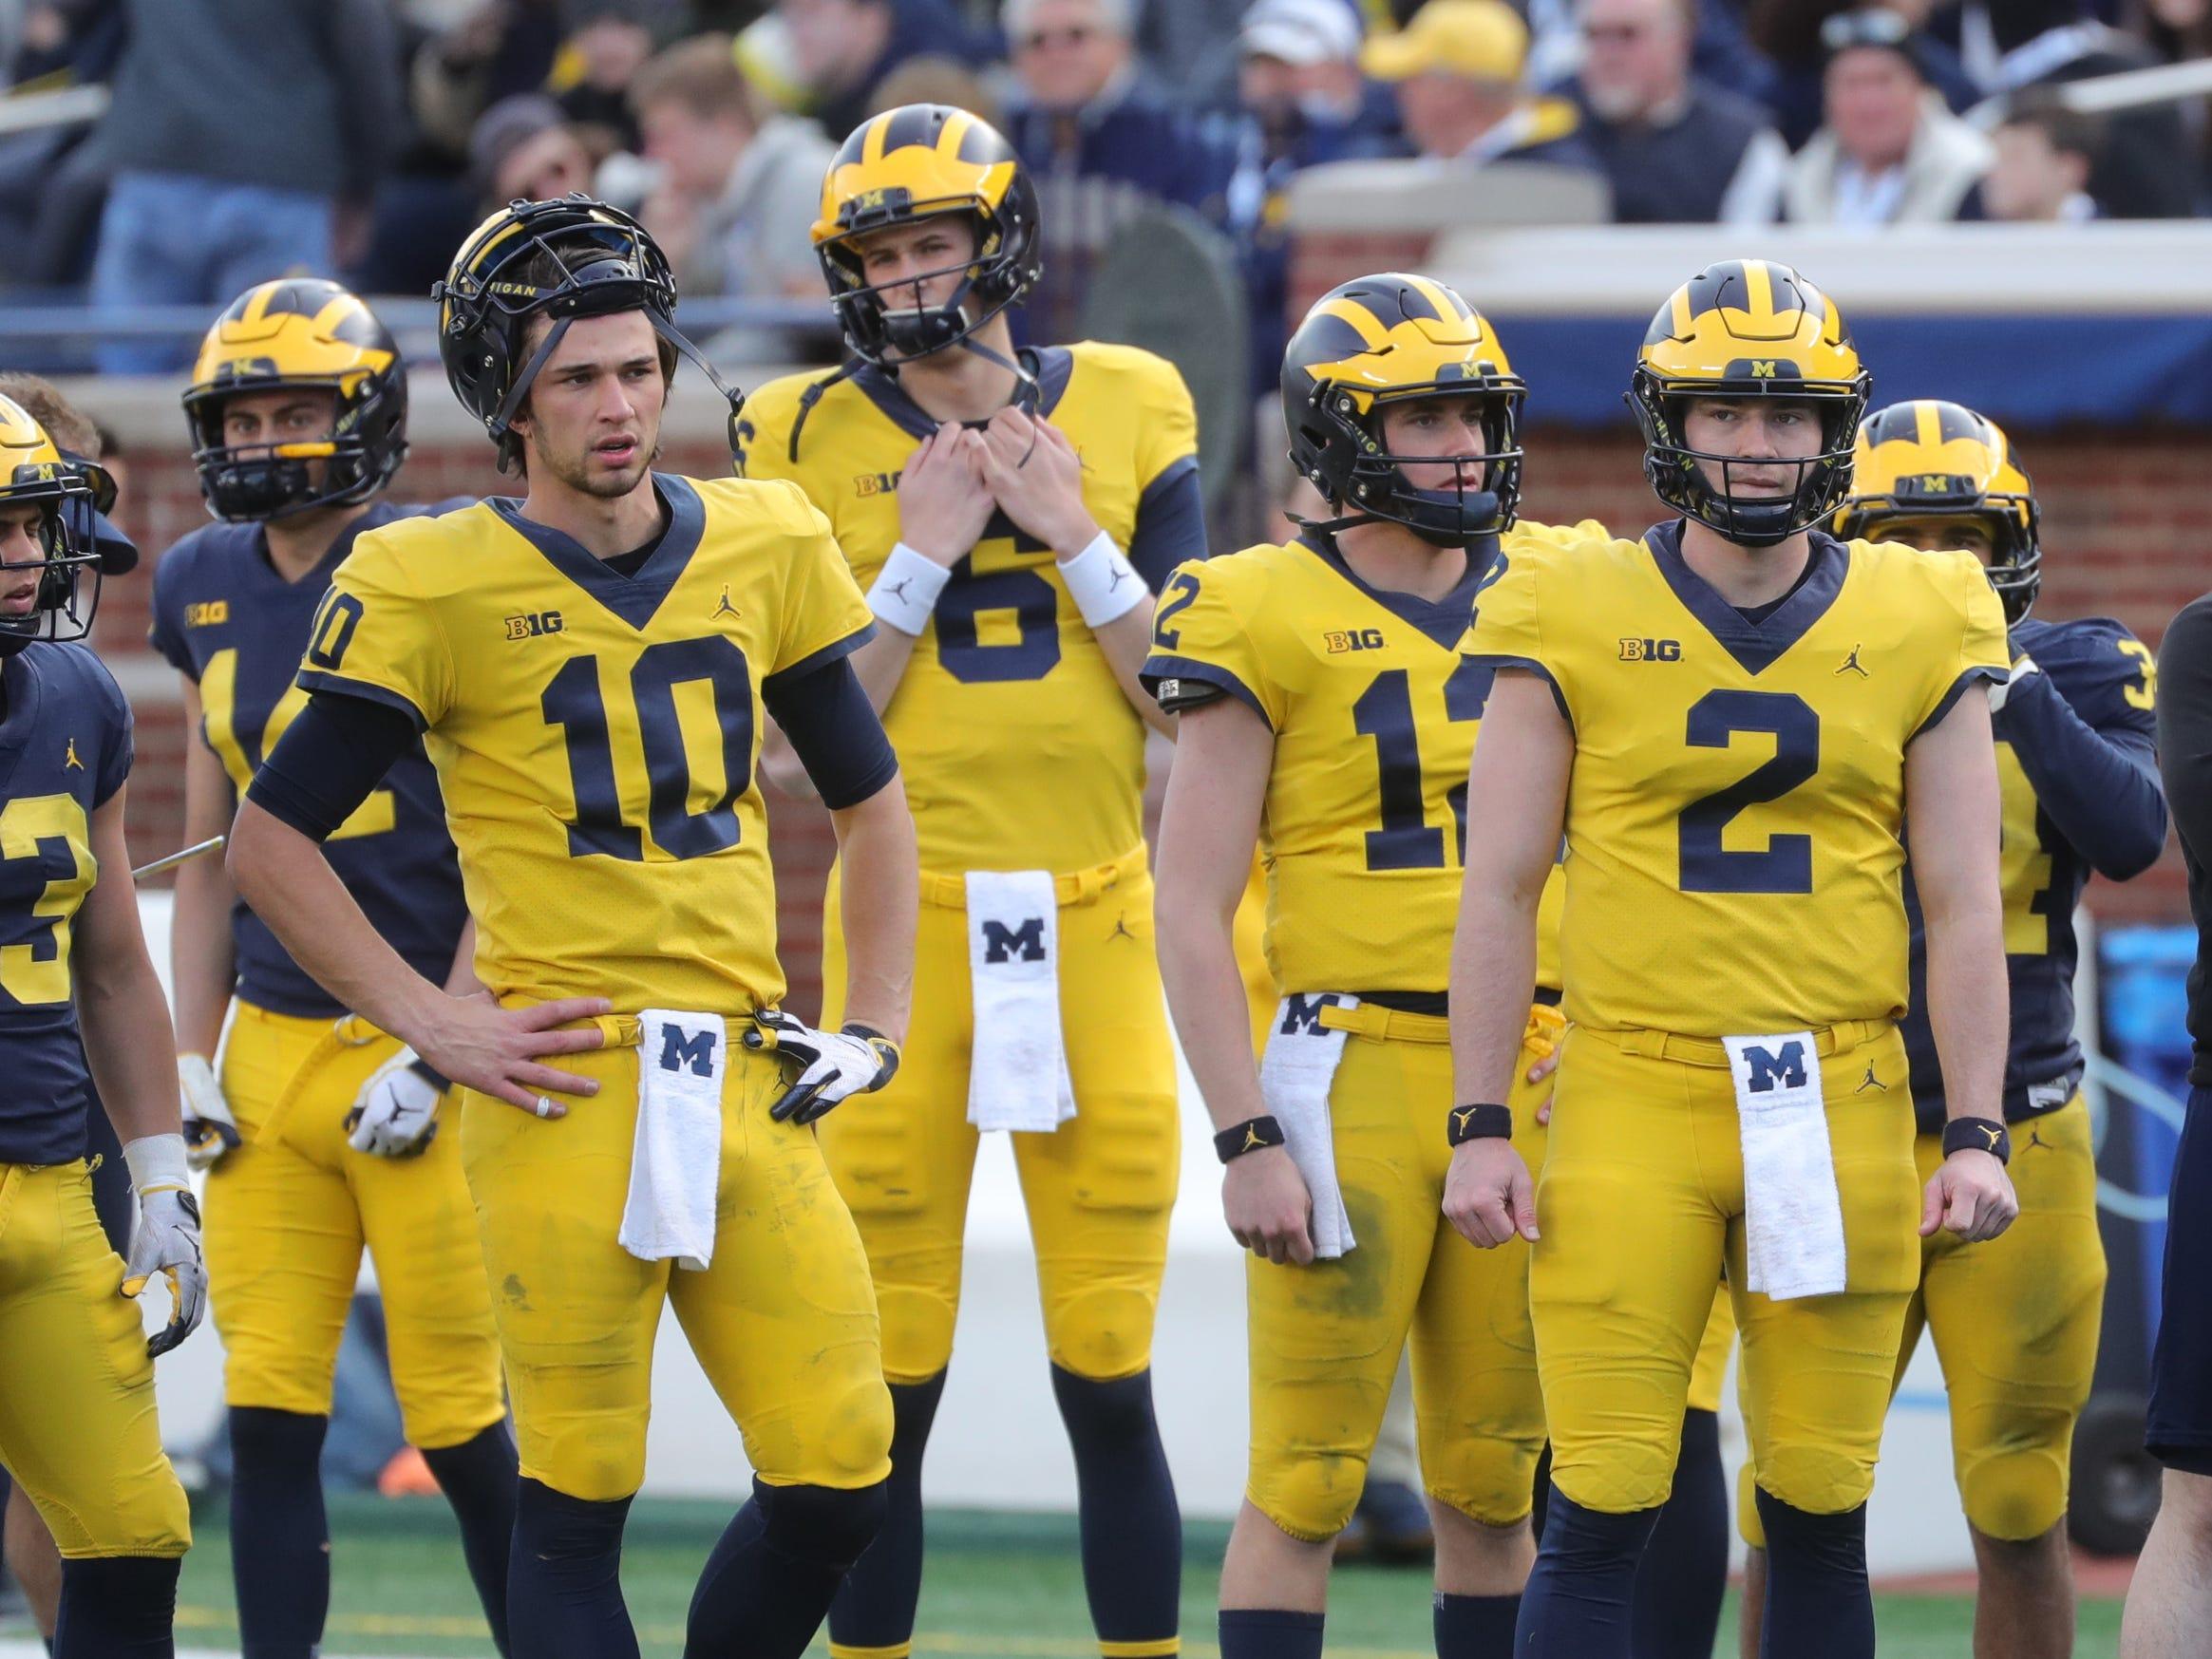 Michigan quarterbacks Shea Patterson (2) and Dylan McCaffrey (10) watch the spring game Saturday, April 13, 2019 at Michigan Stadium in Ann Arbor.